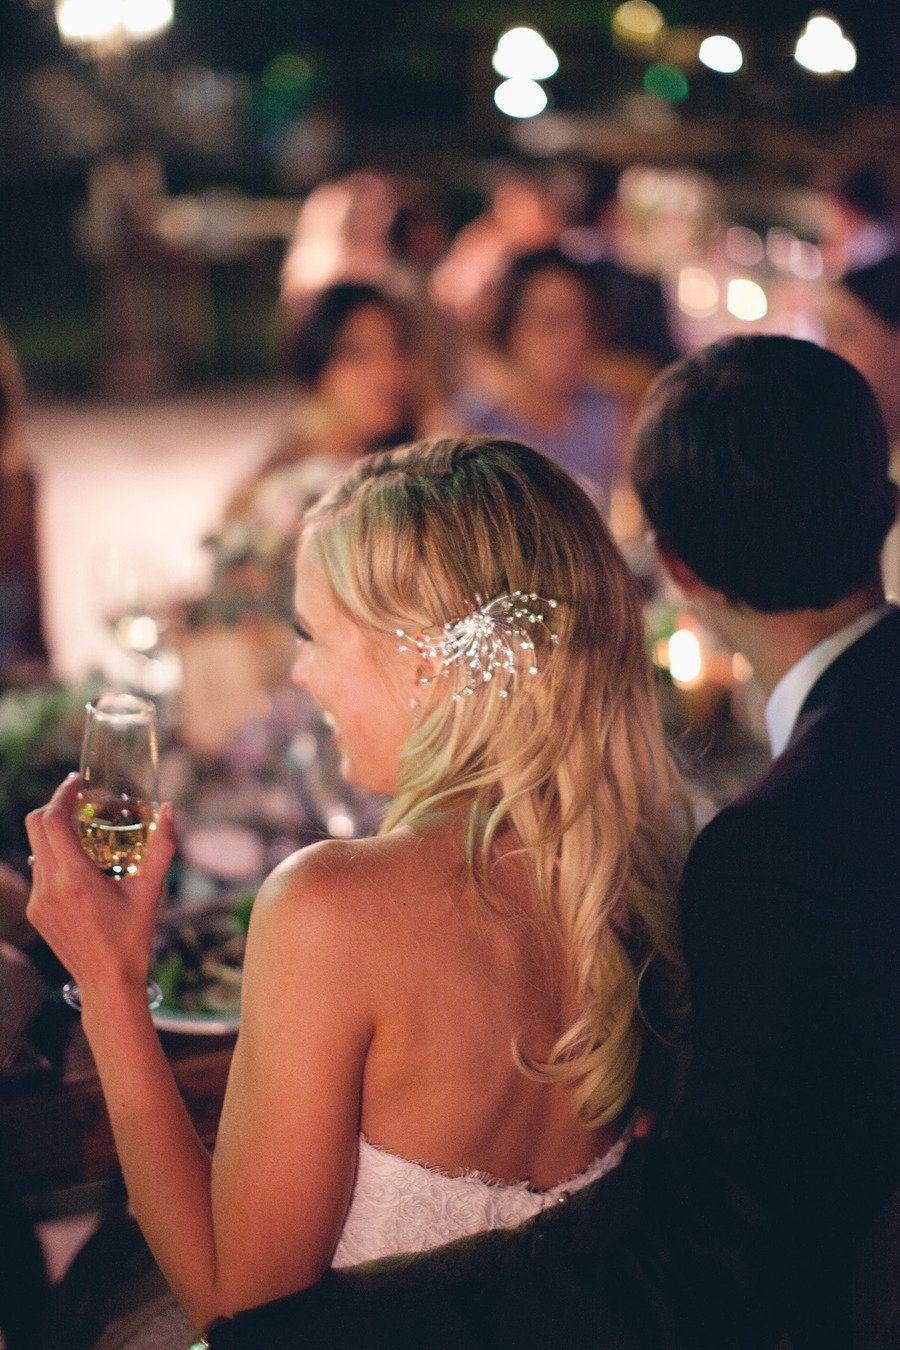 #hair-accessories  Photography: Erin Hearts Court - erinheartscourt.com Flowers: Fiore Designs - fioredesigns.com Event Coordination + Design: Savoir Flair Weddings - savoirflairweddings.com/  Read More: http://stylemepretty.com/2012/02/03/temecula-wedding-by-erin-hearts-court/